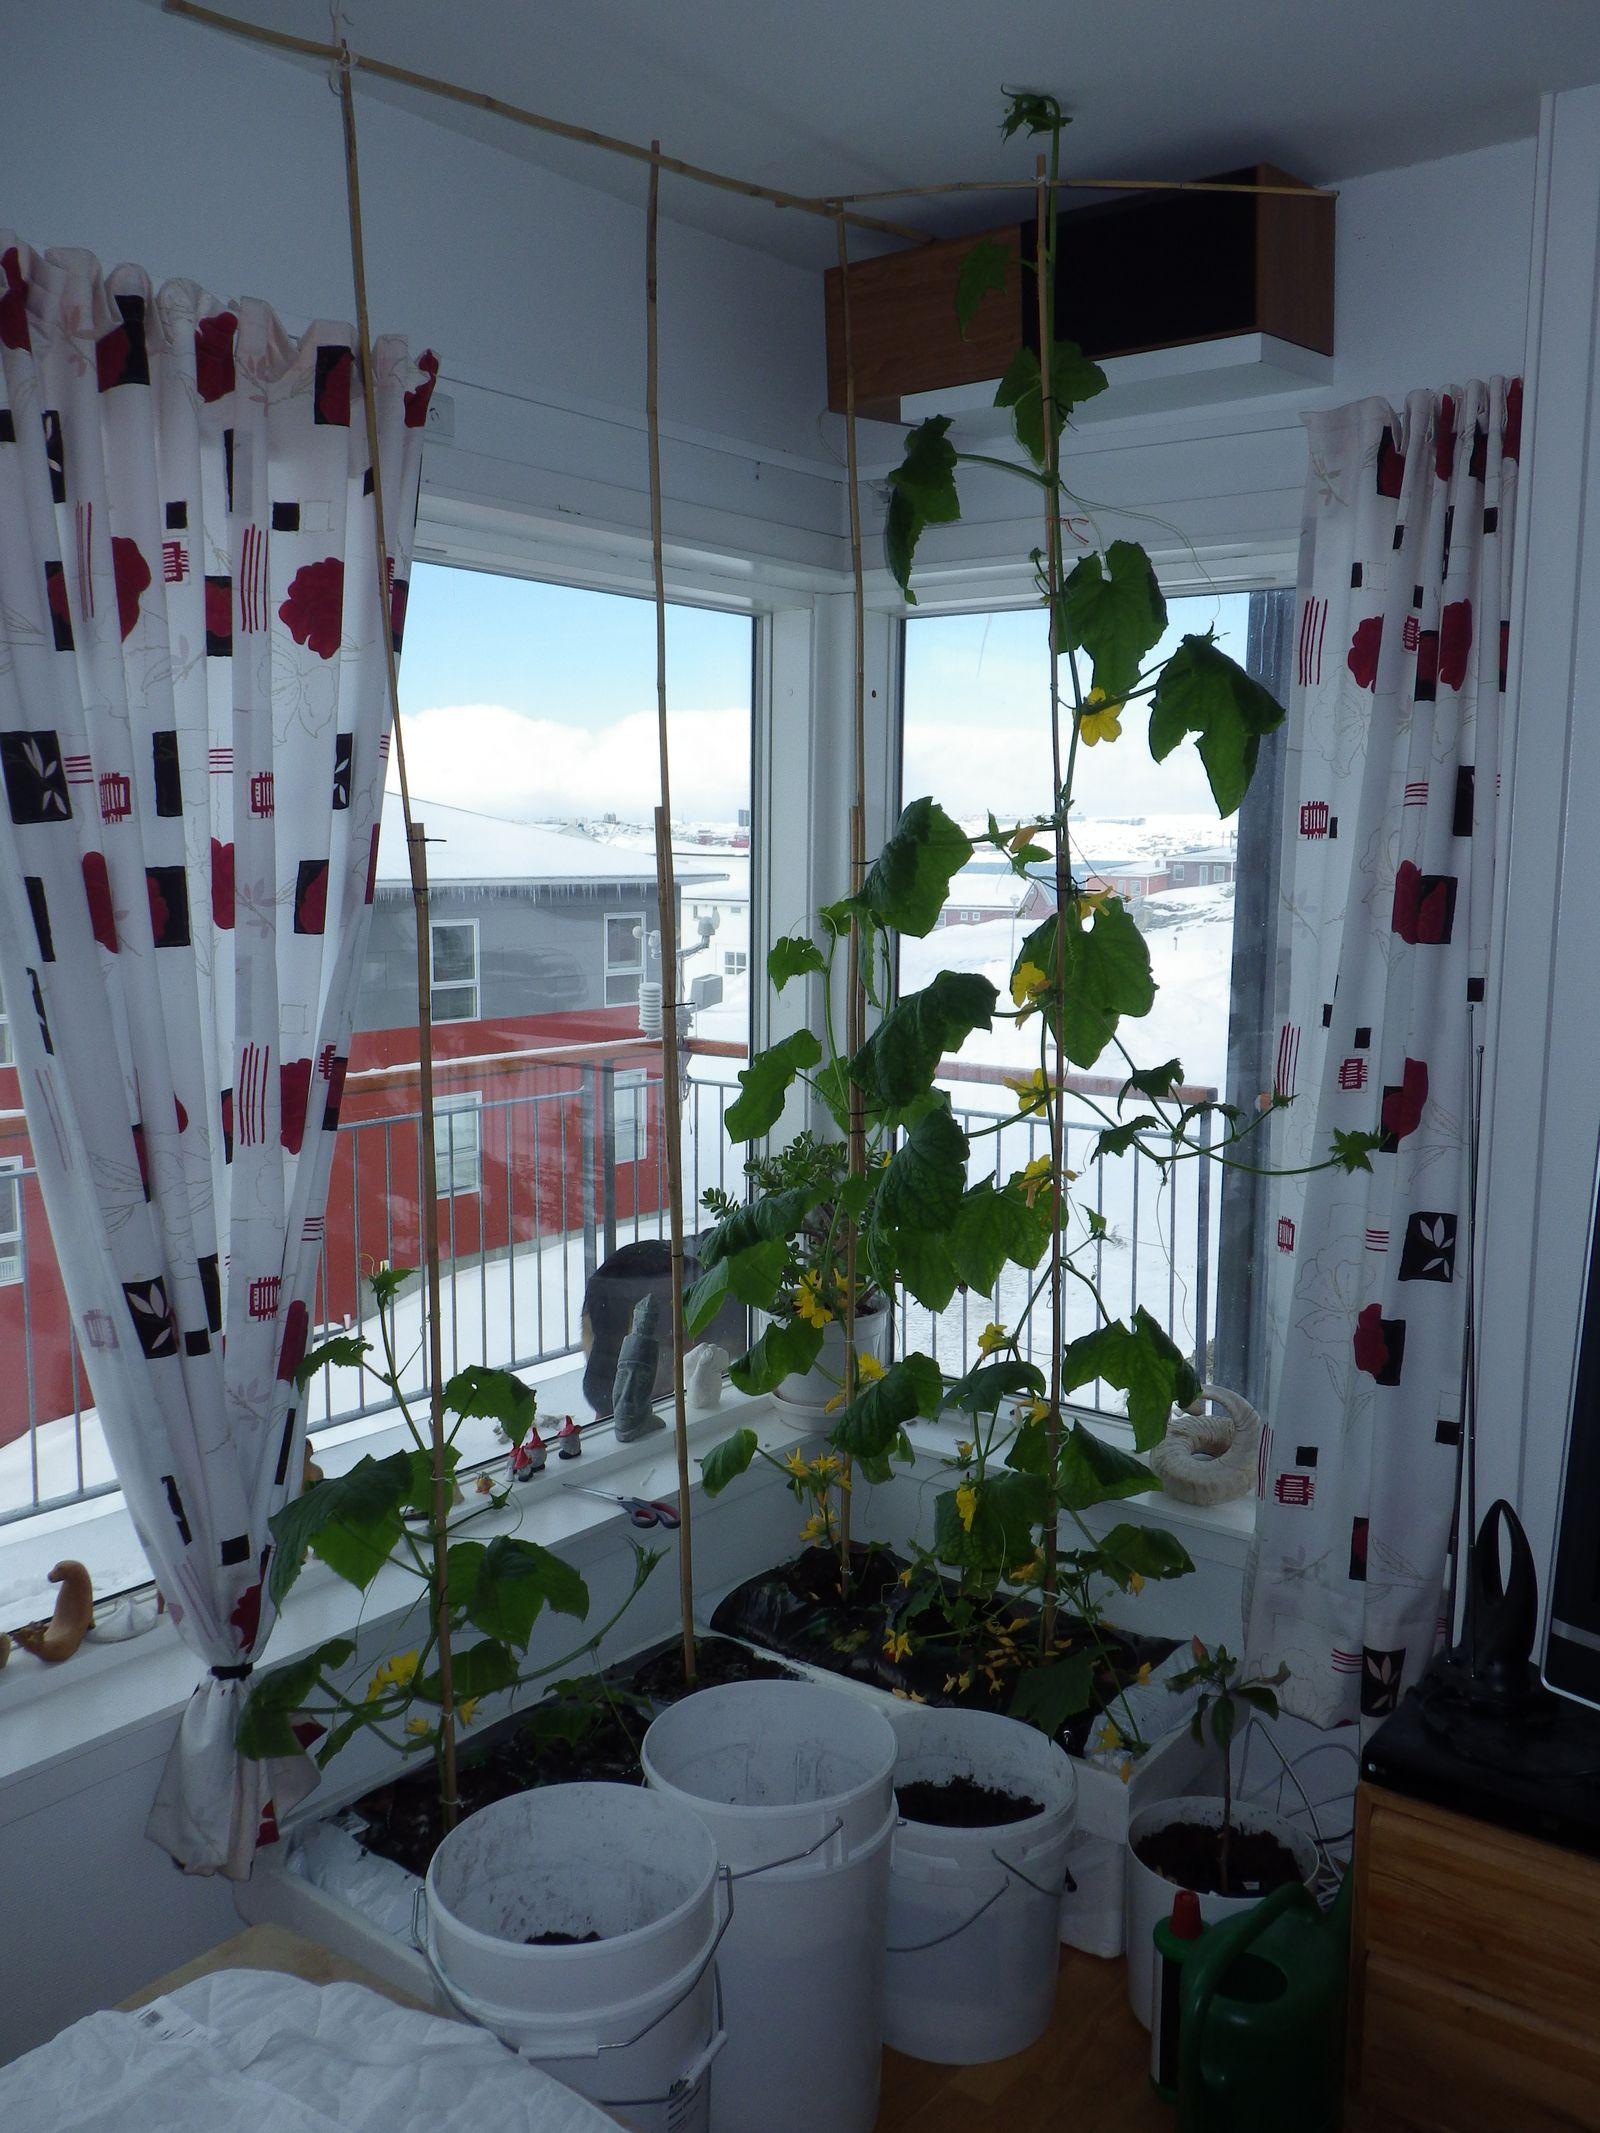 2014-04-29-0822_-_Agurkeplante_Kartofelspande_Planter